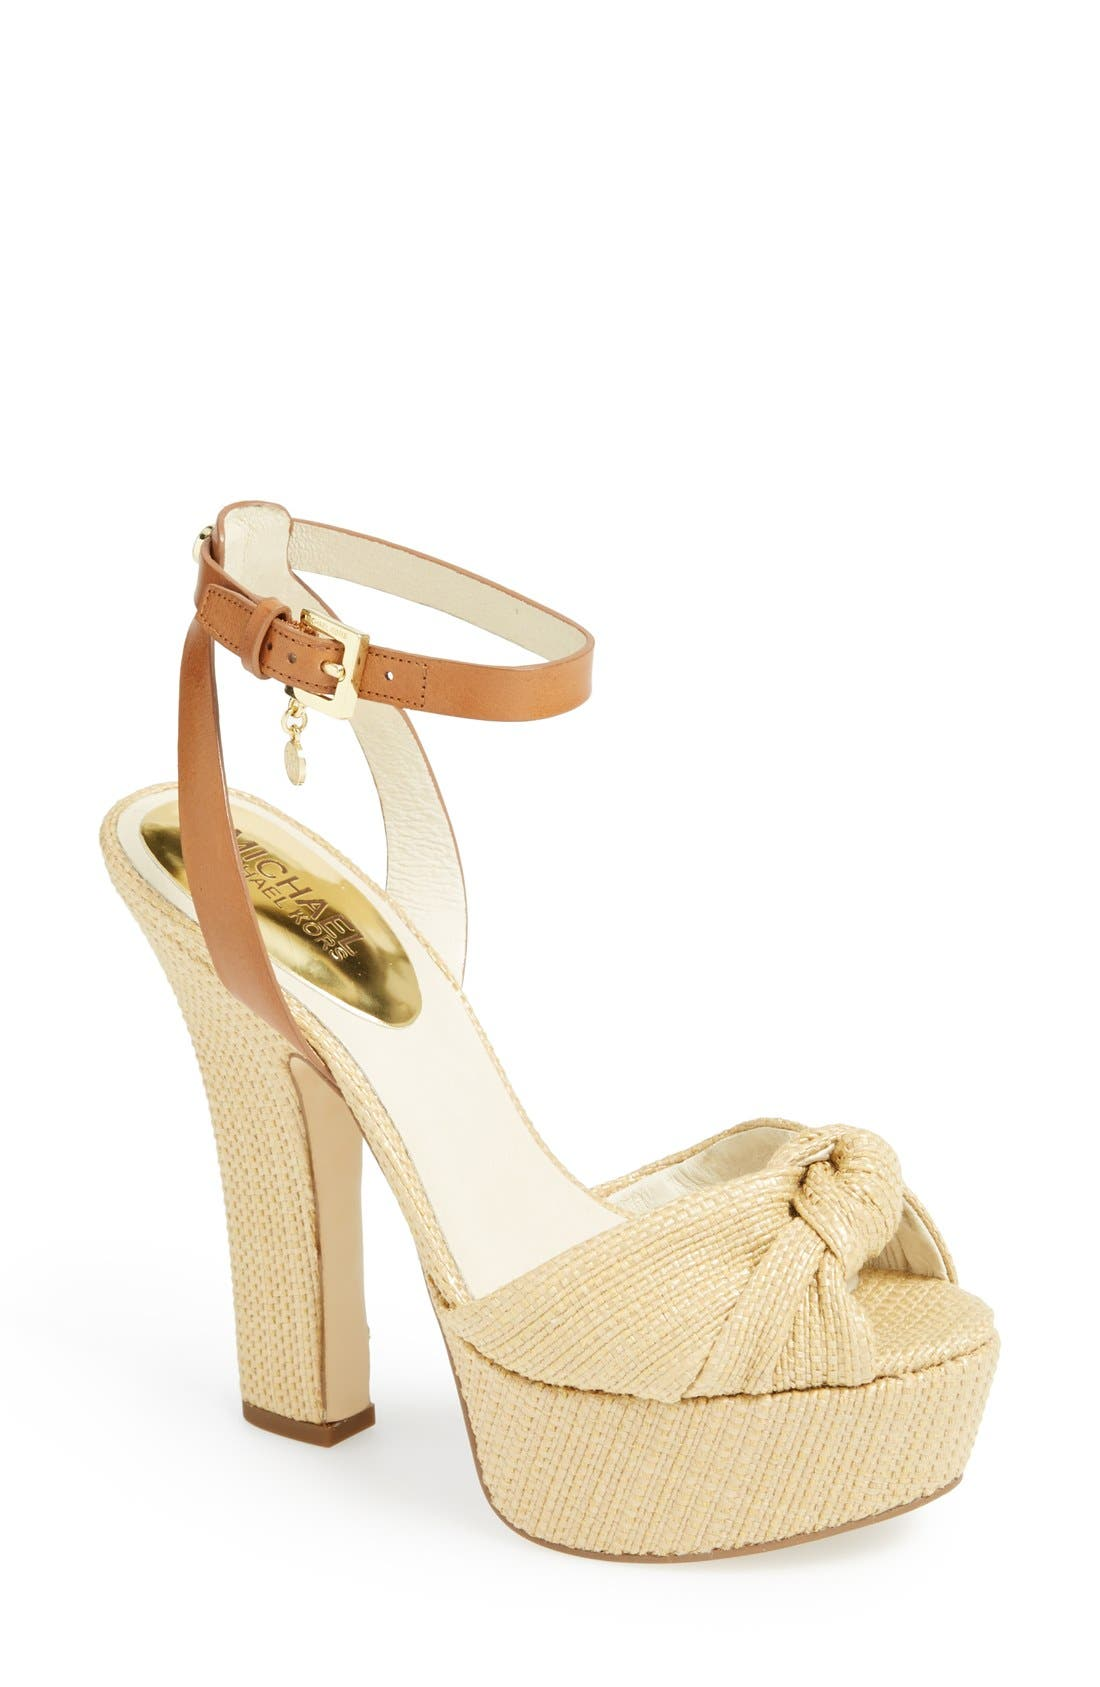 Main Image - MICHAEL Michael Kors 'Benji' Platform Sandal